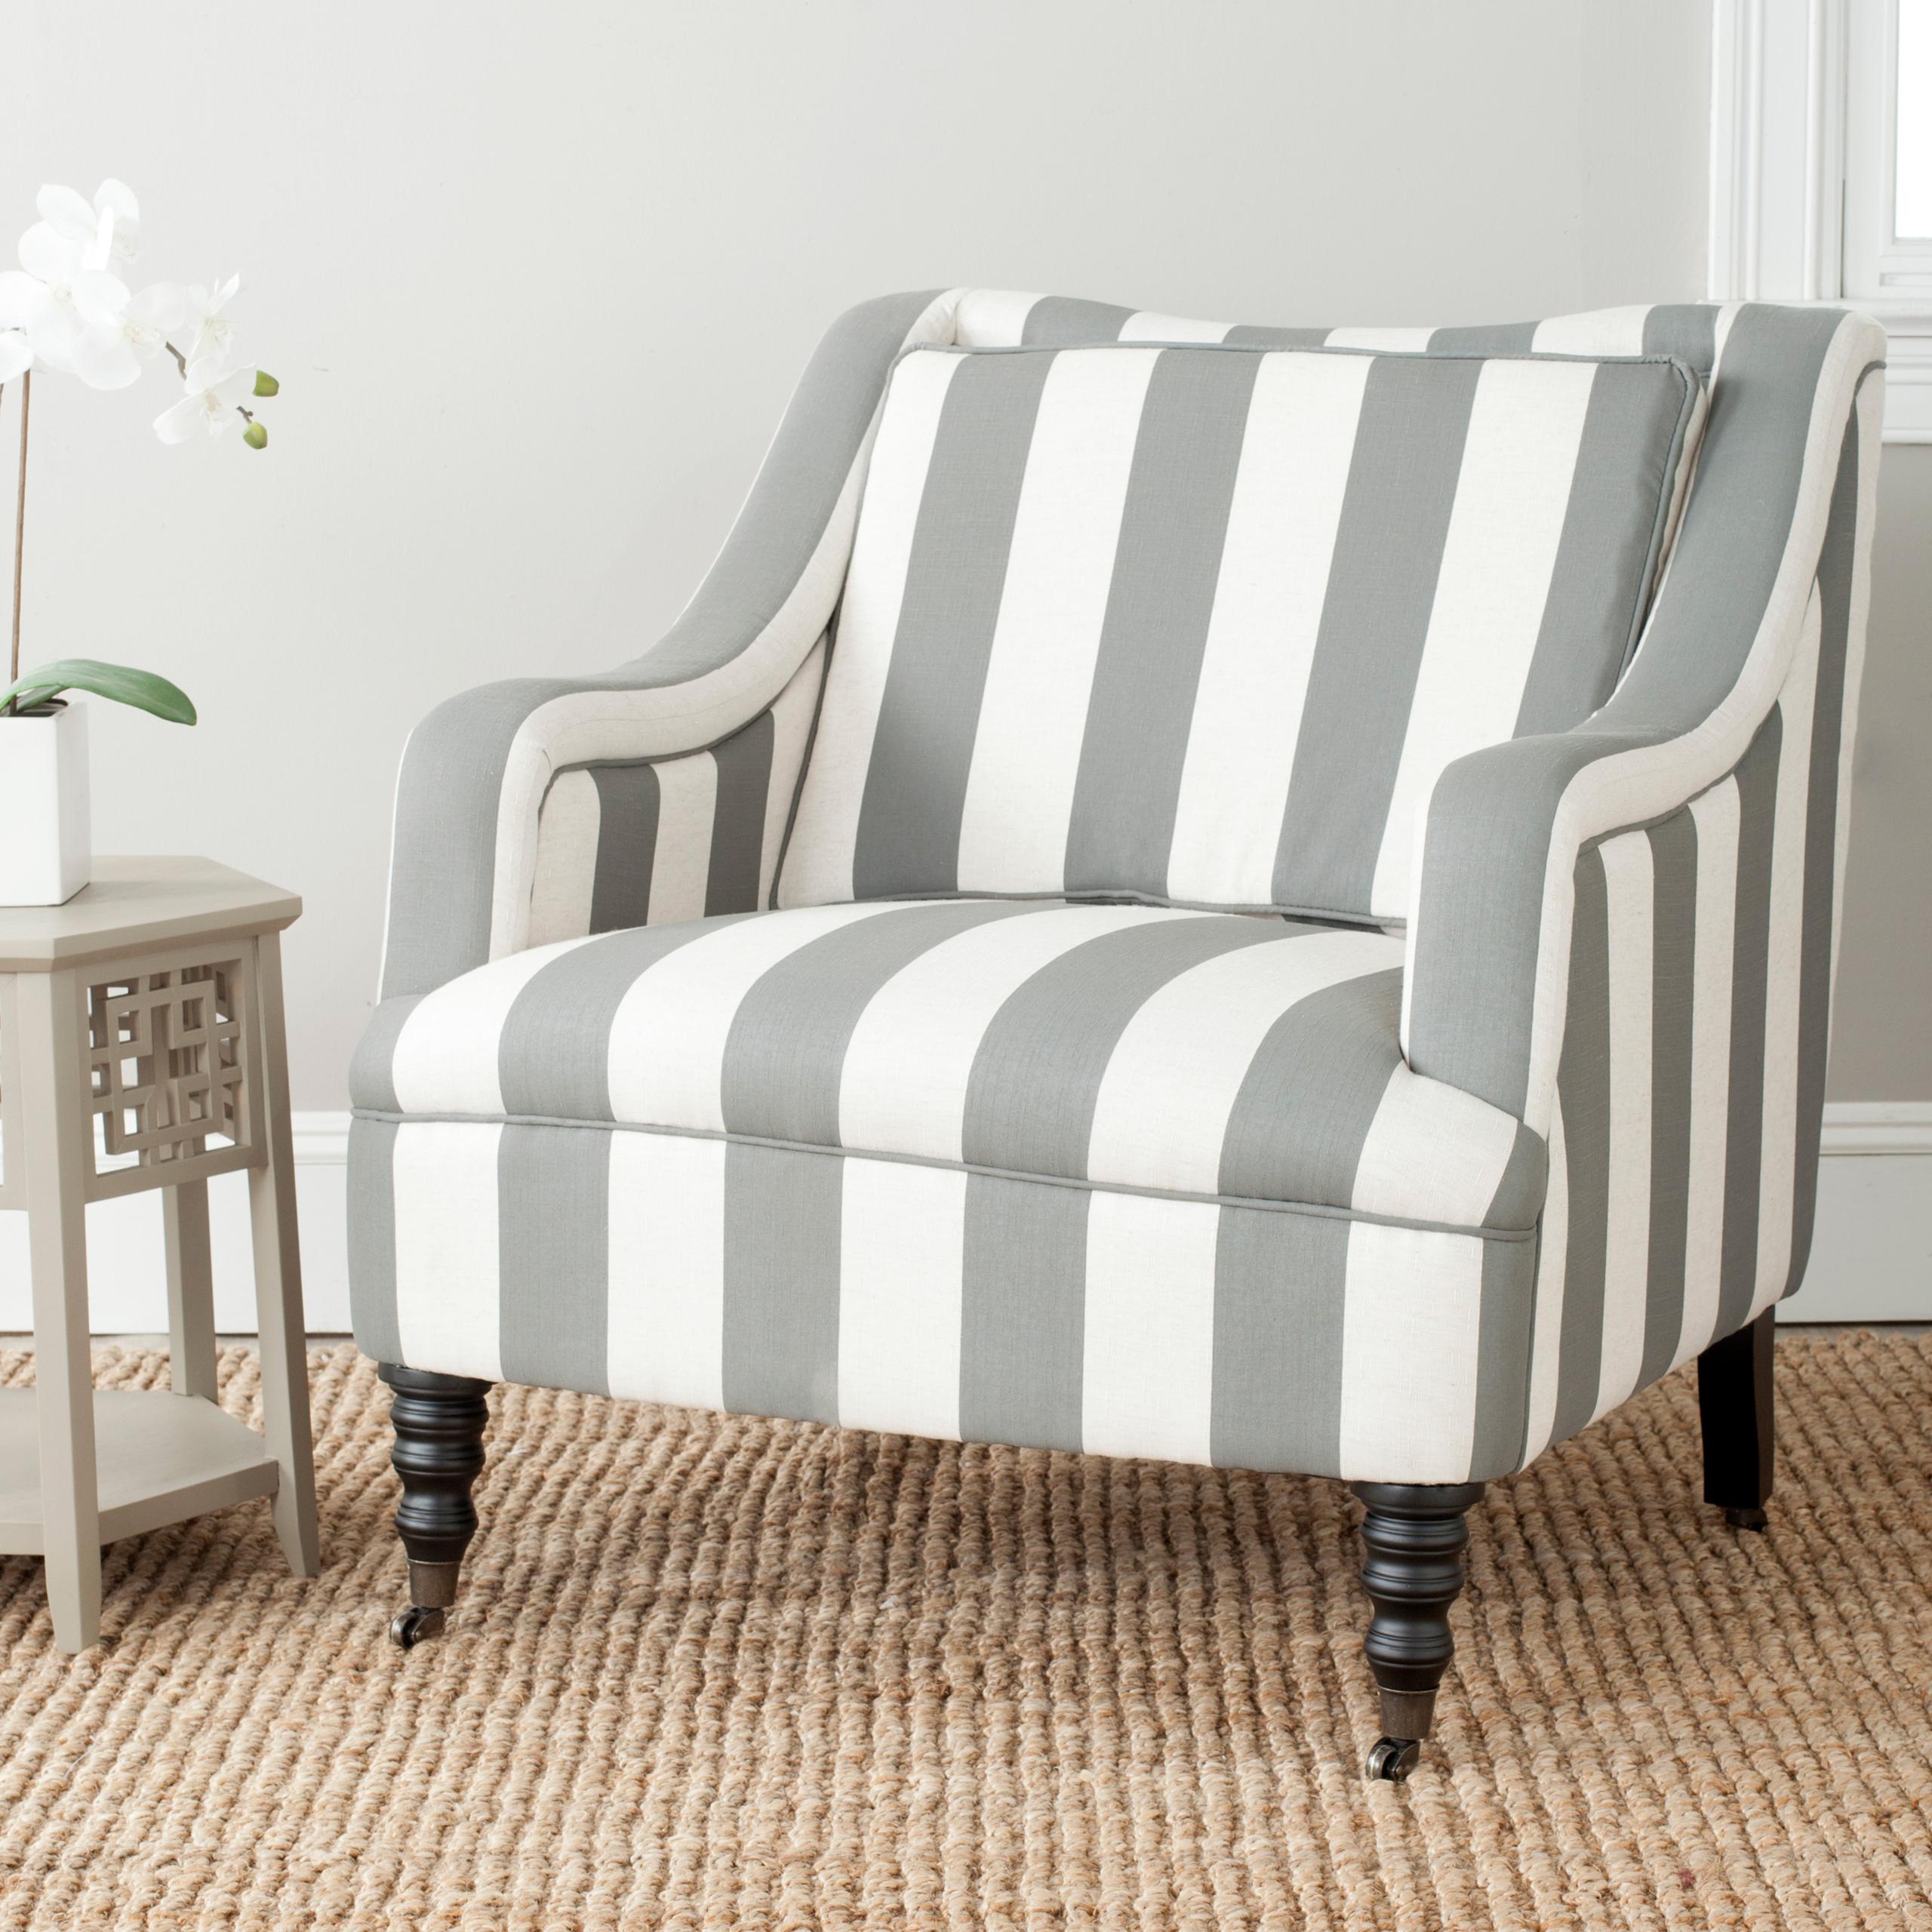 Beautiful Striped Chair 1